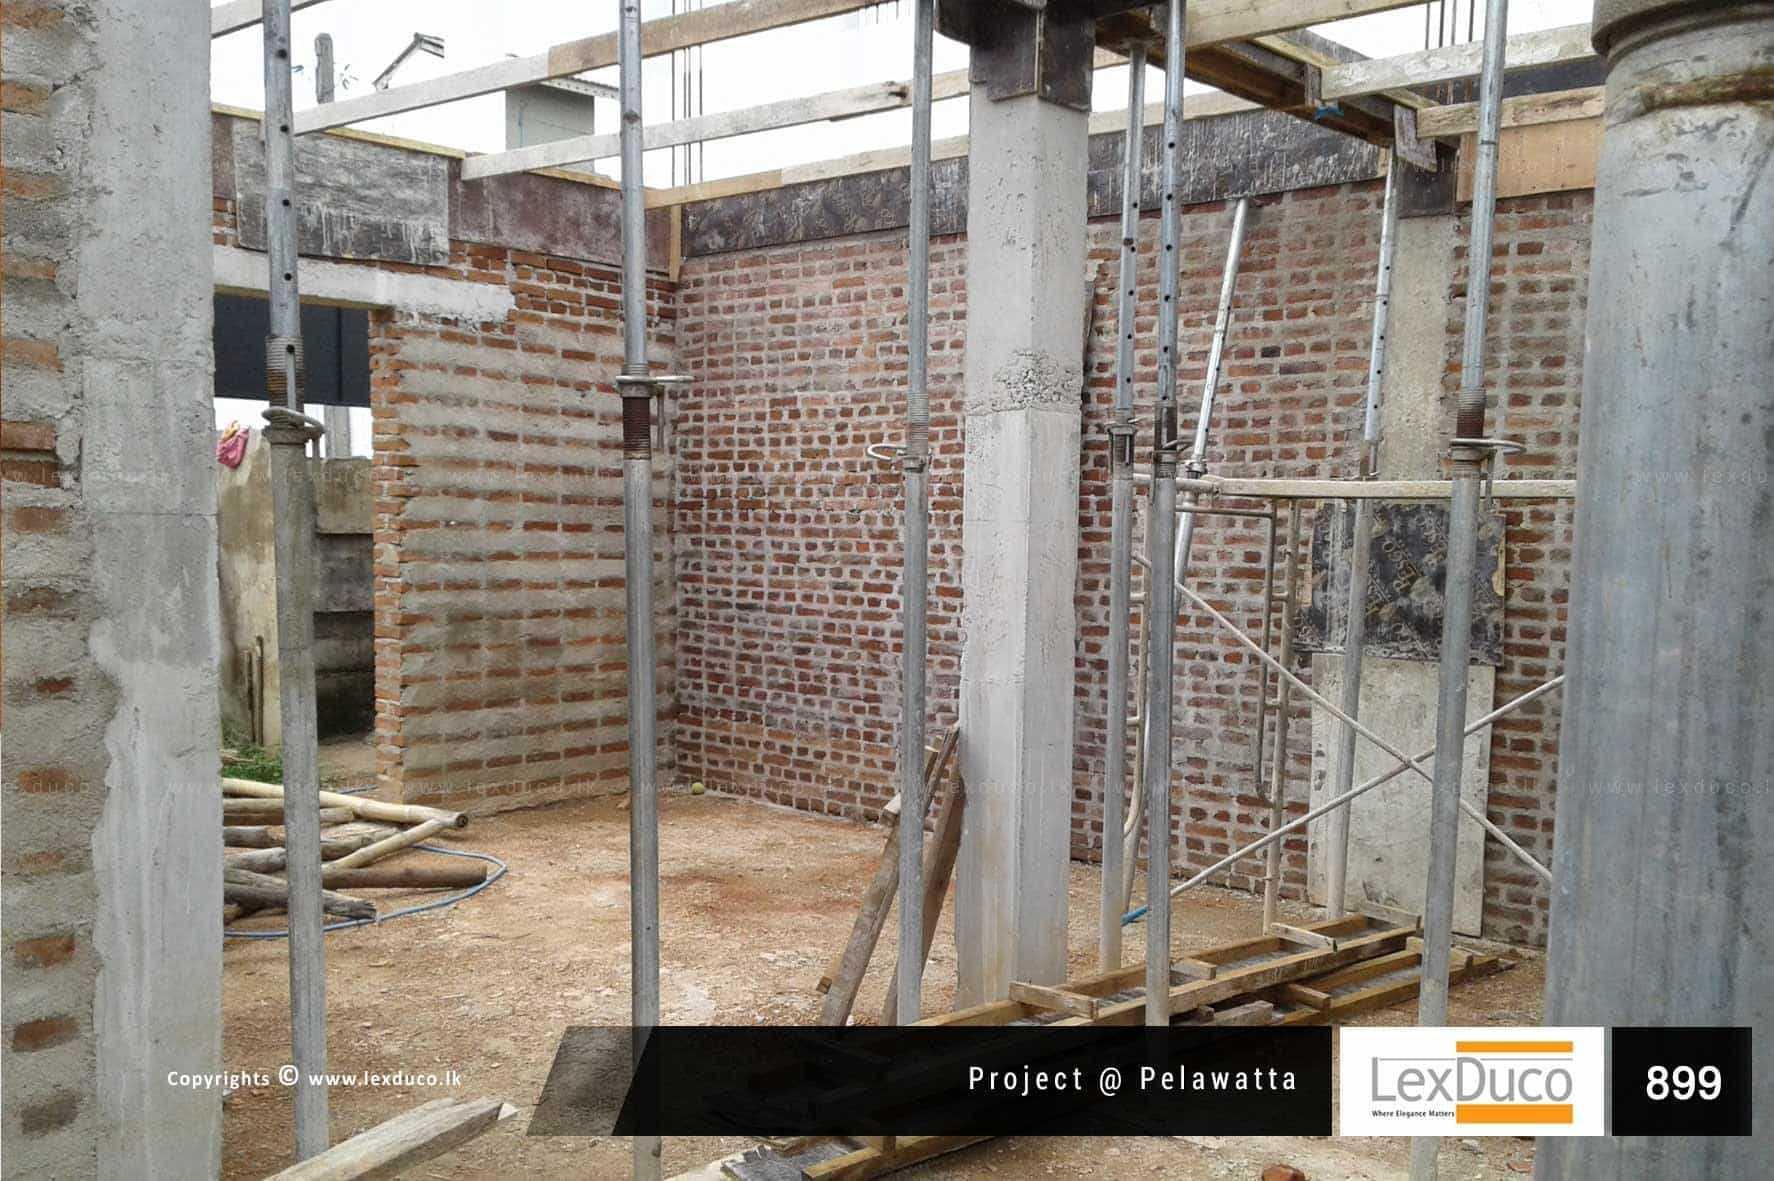 Residential Housing Project at Pelawatta | Lex Duco